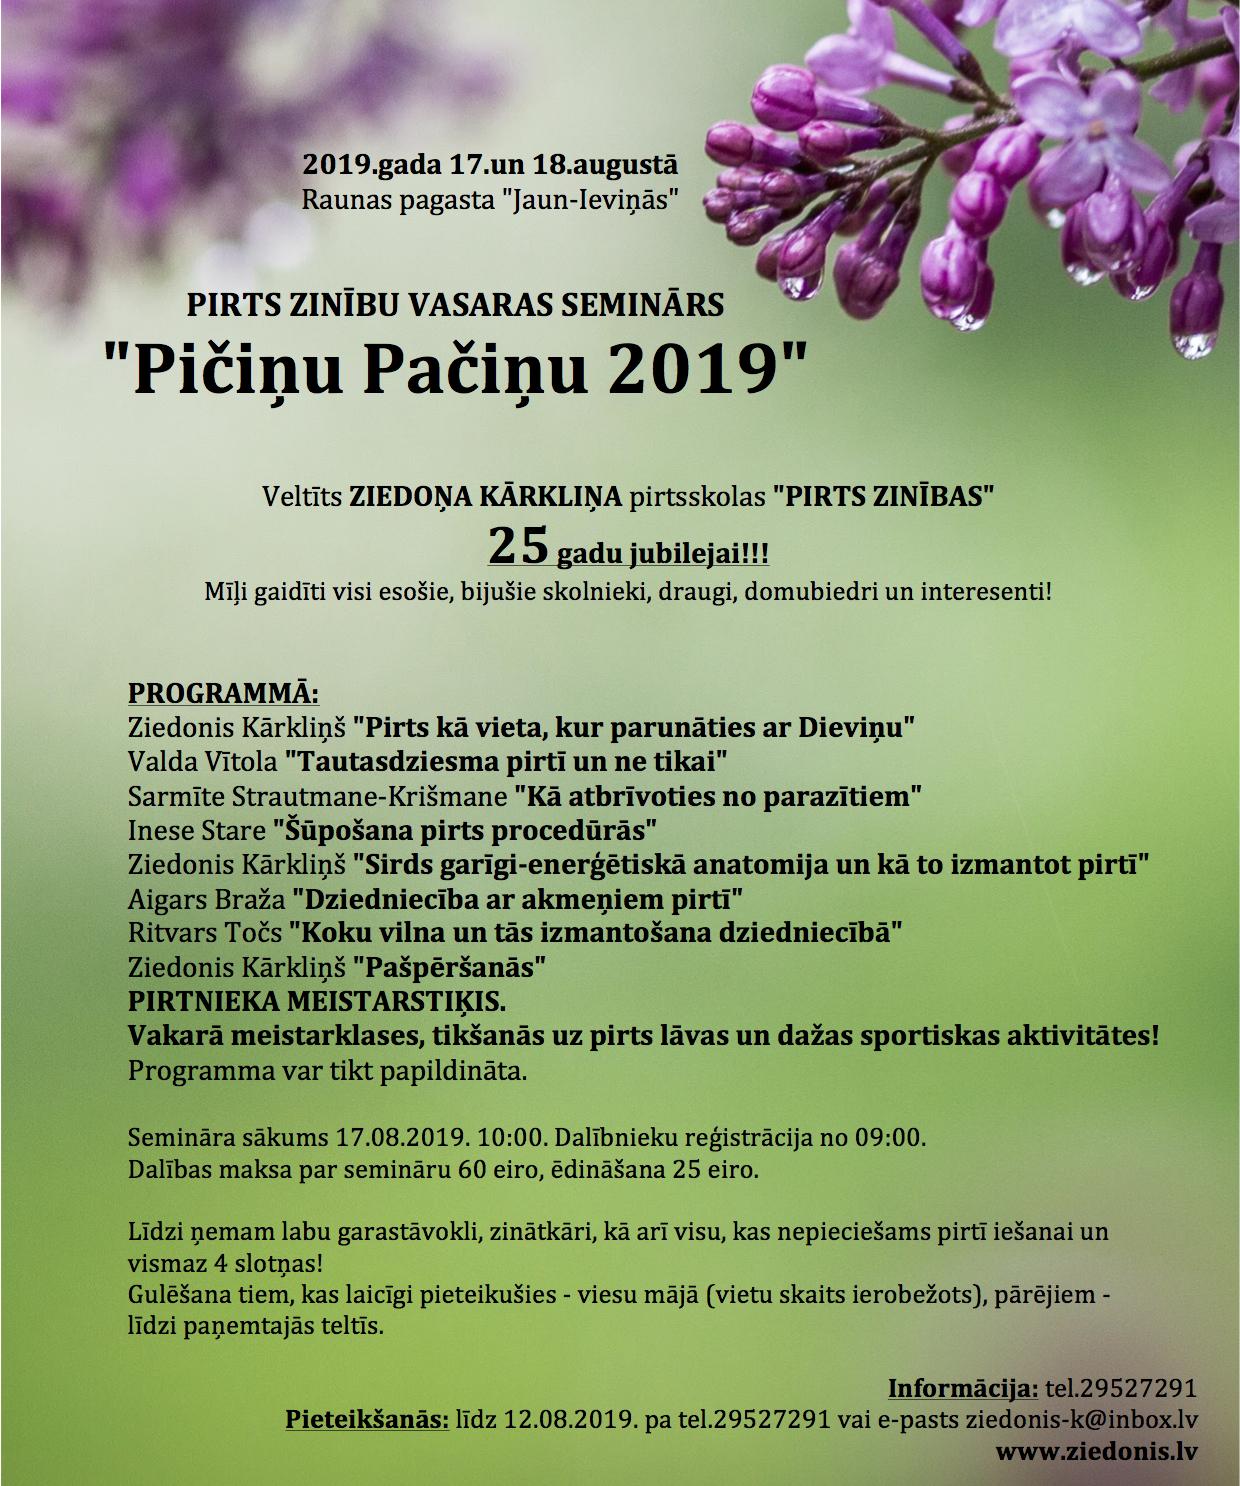 PicinuPacinu_2019_YYY